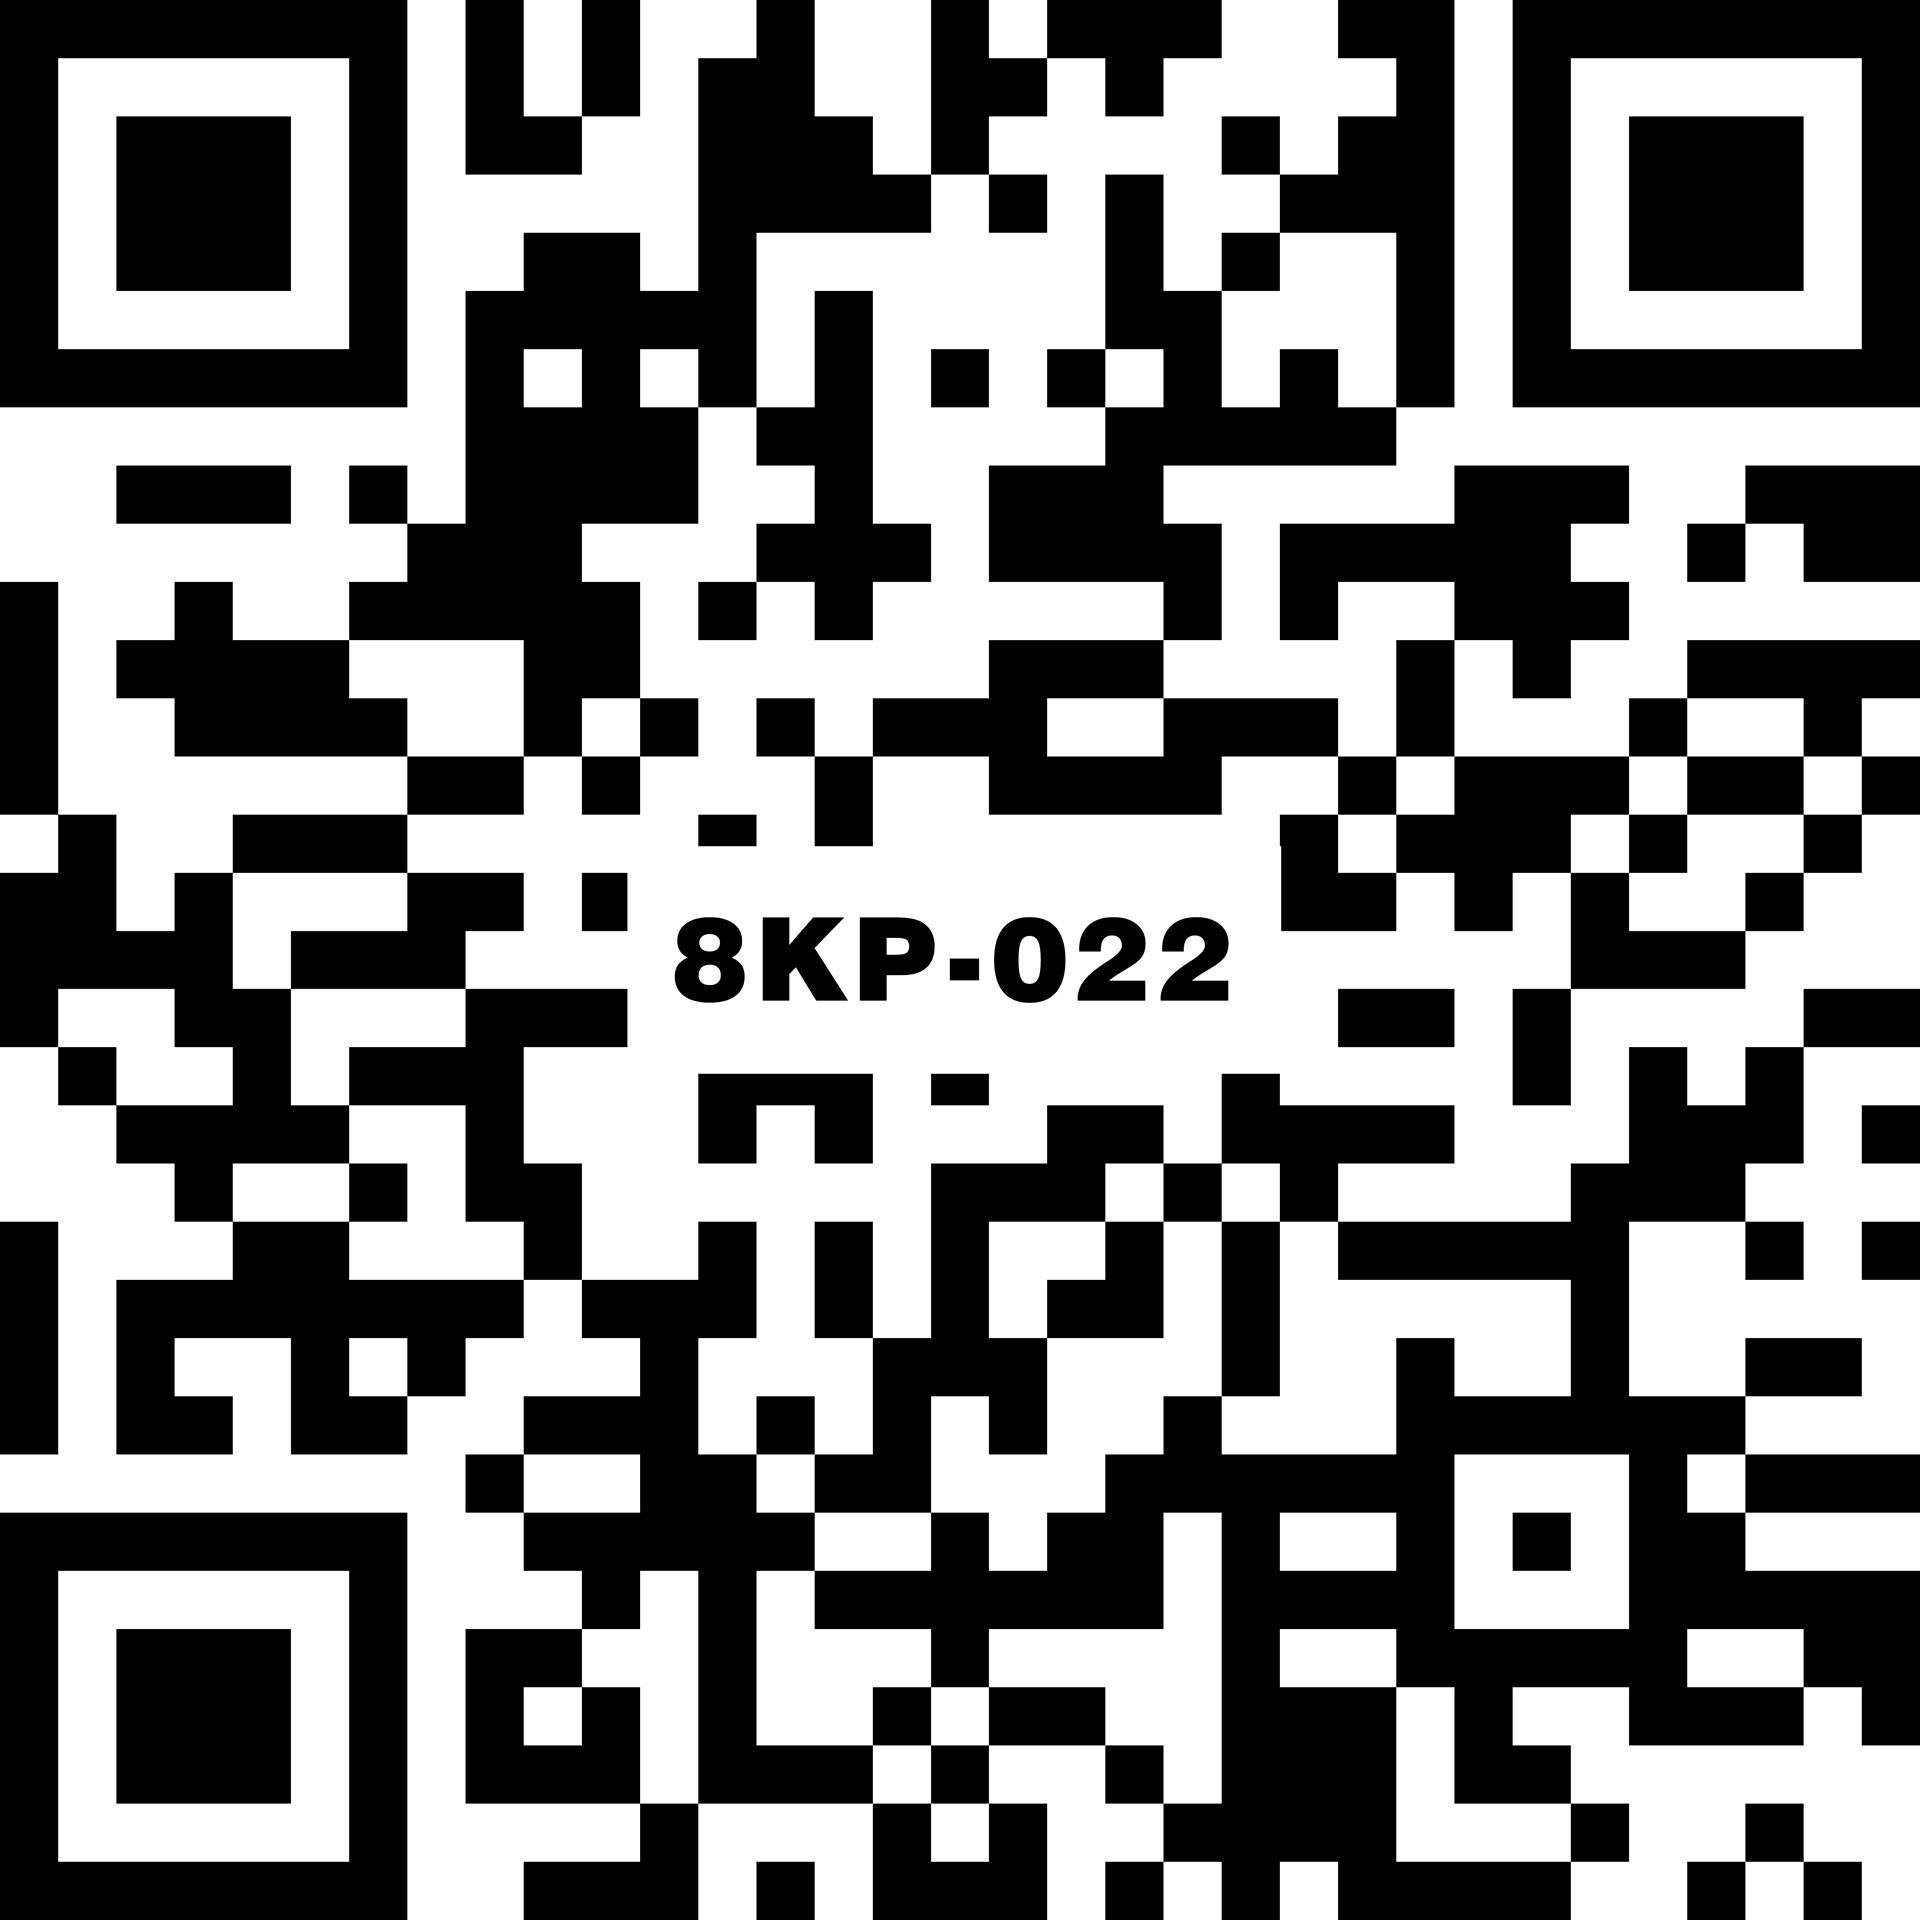 8KP-022